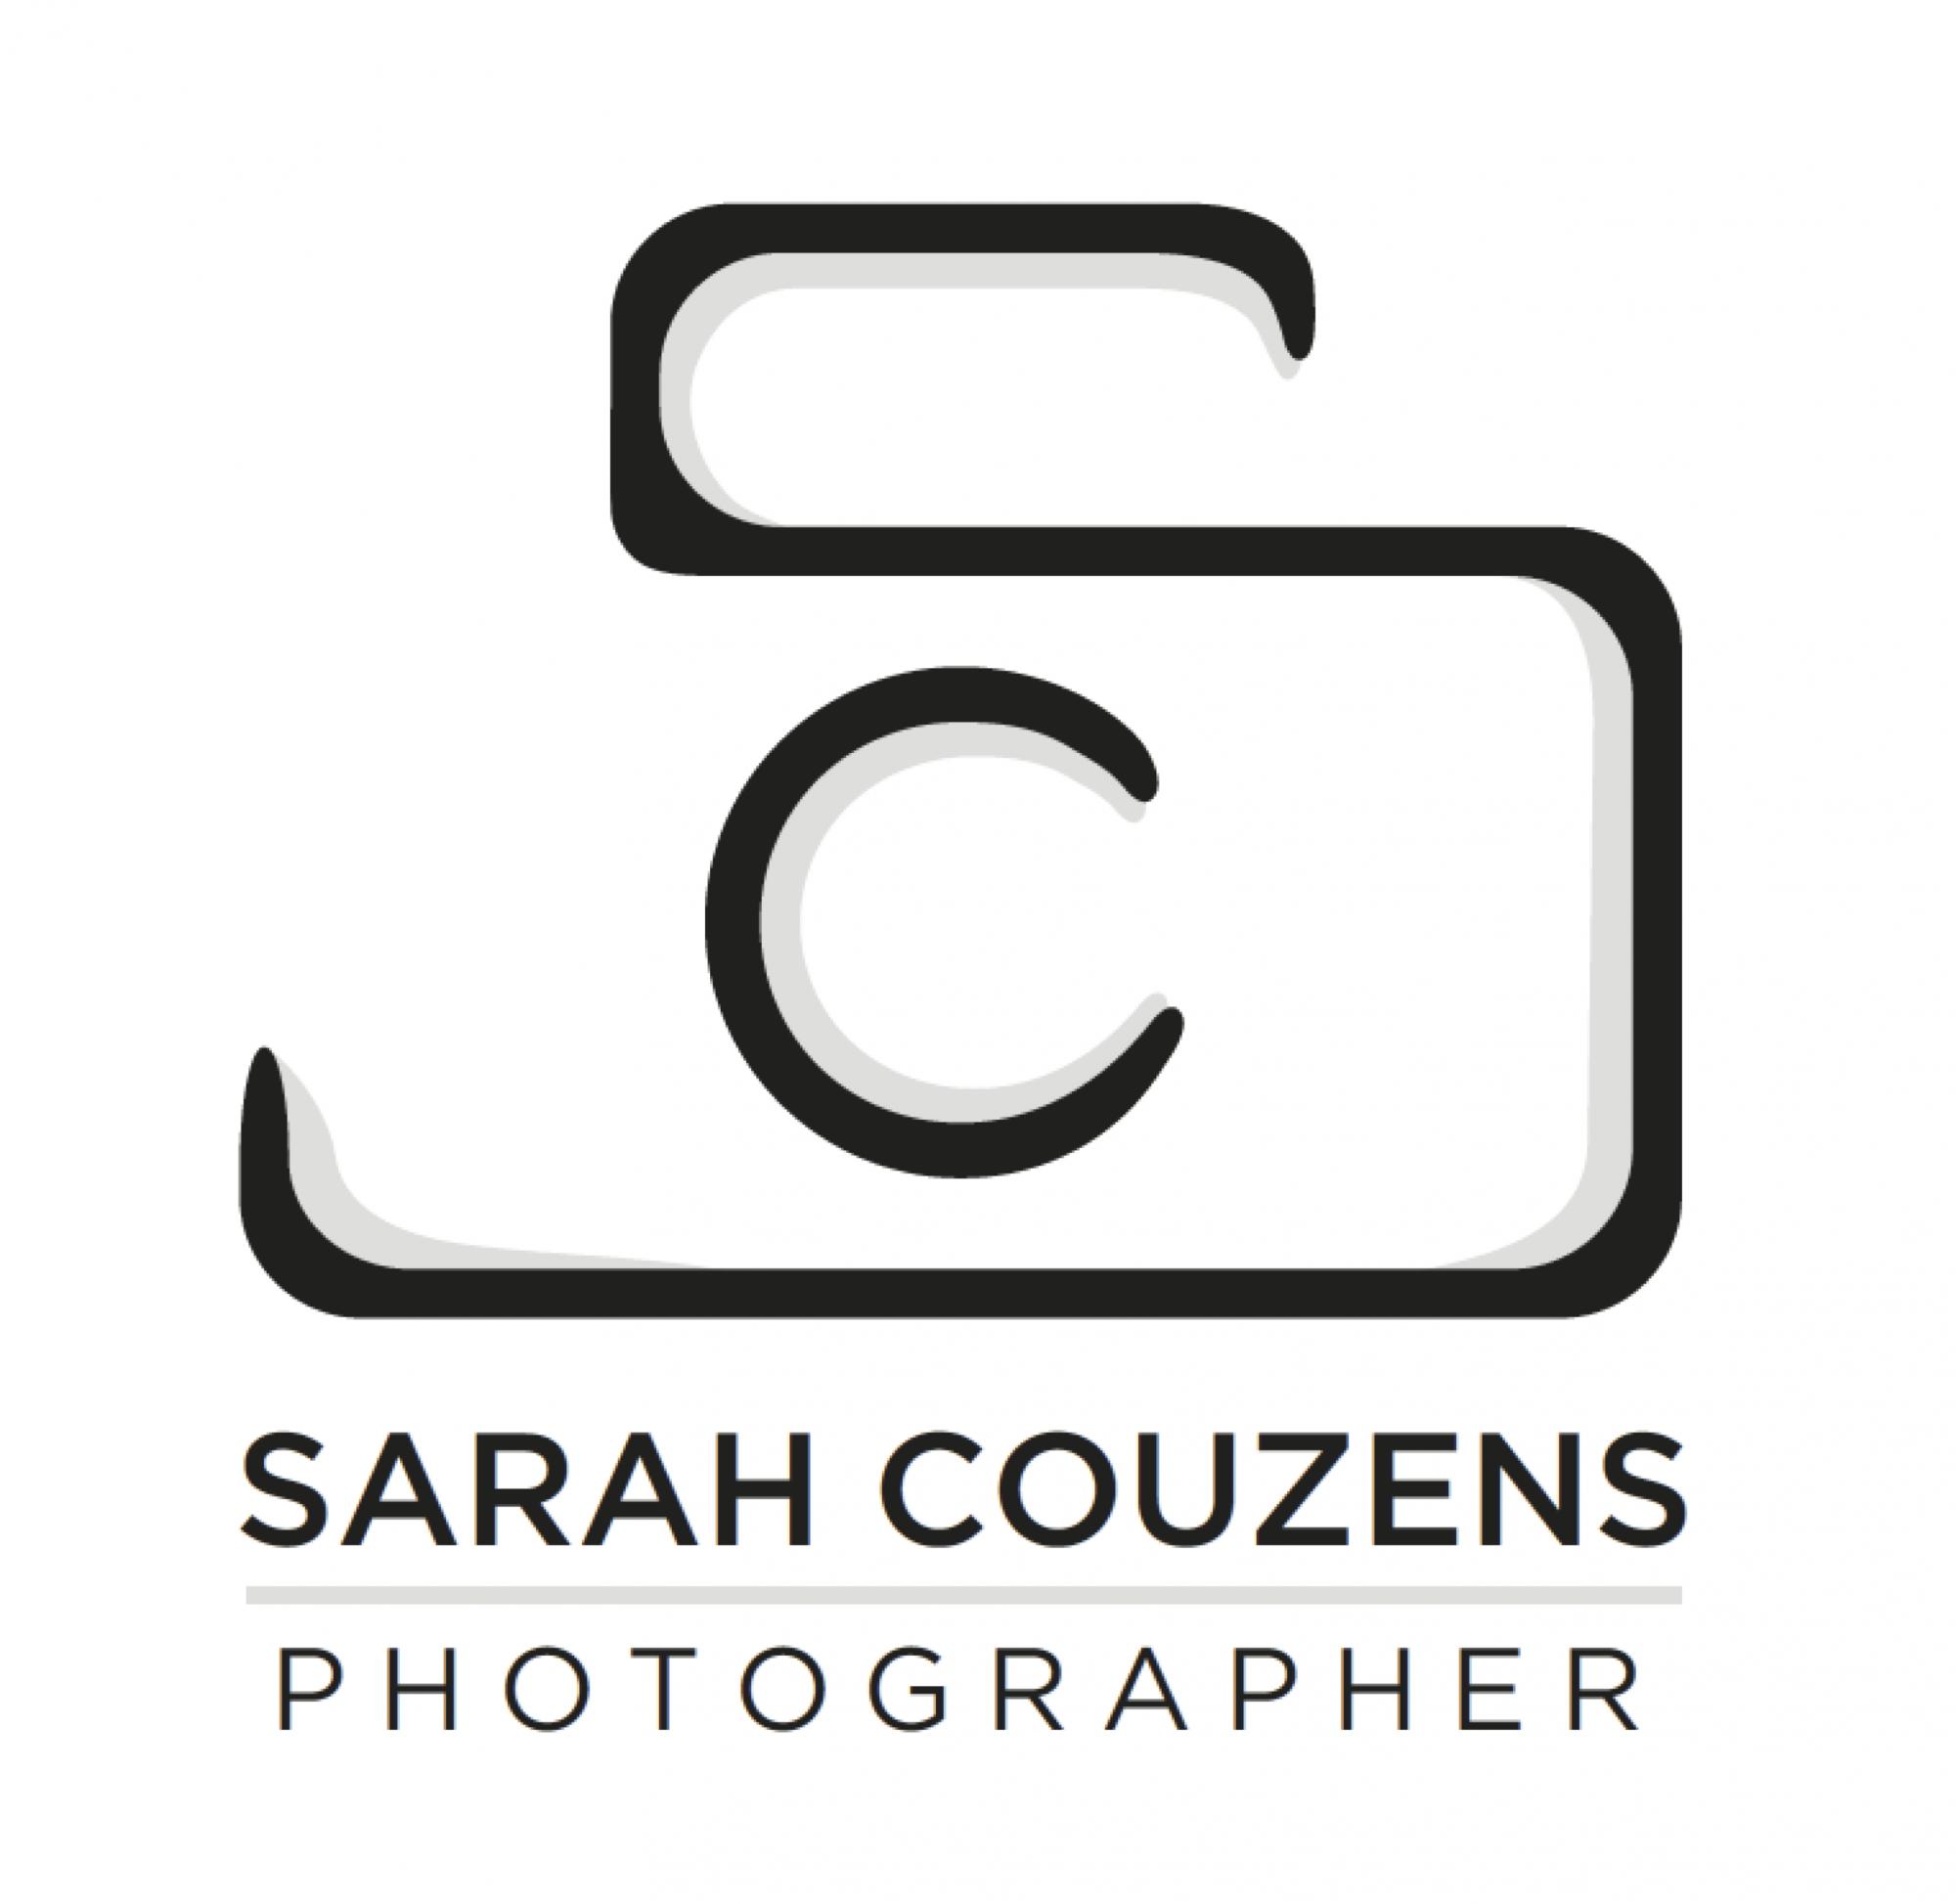 Sarah Couzens Photographer Brands of the World